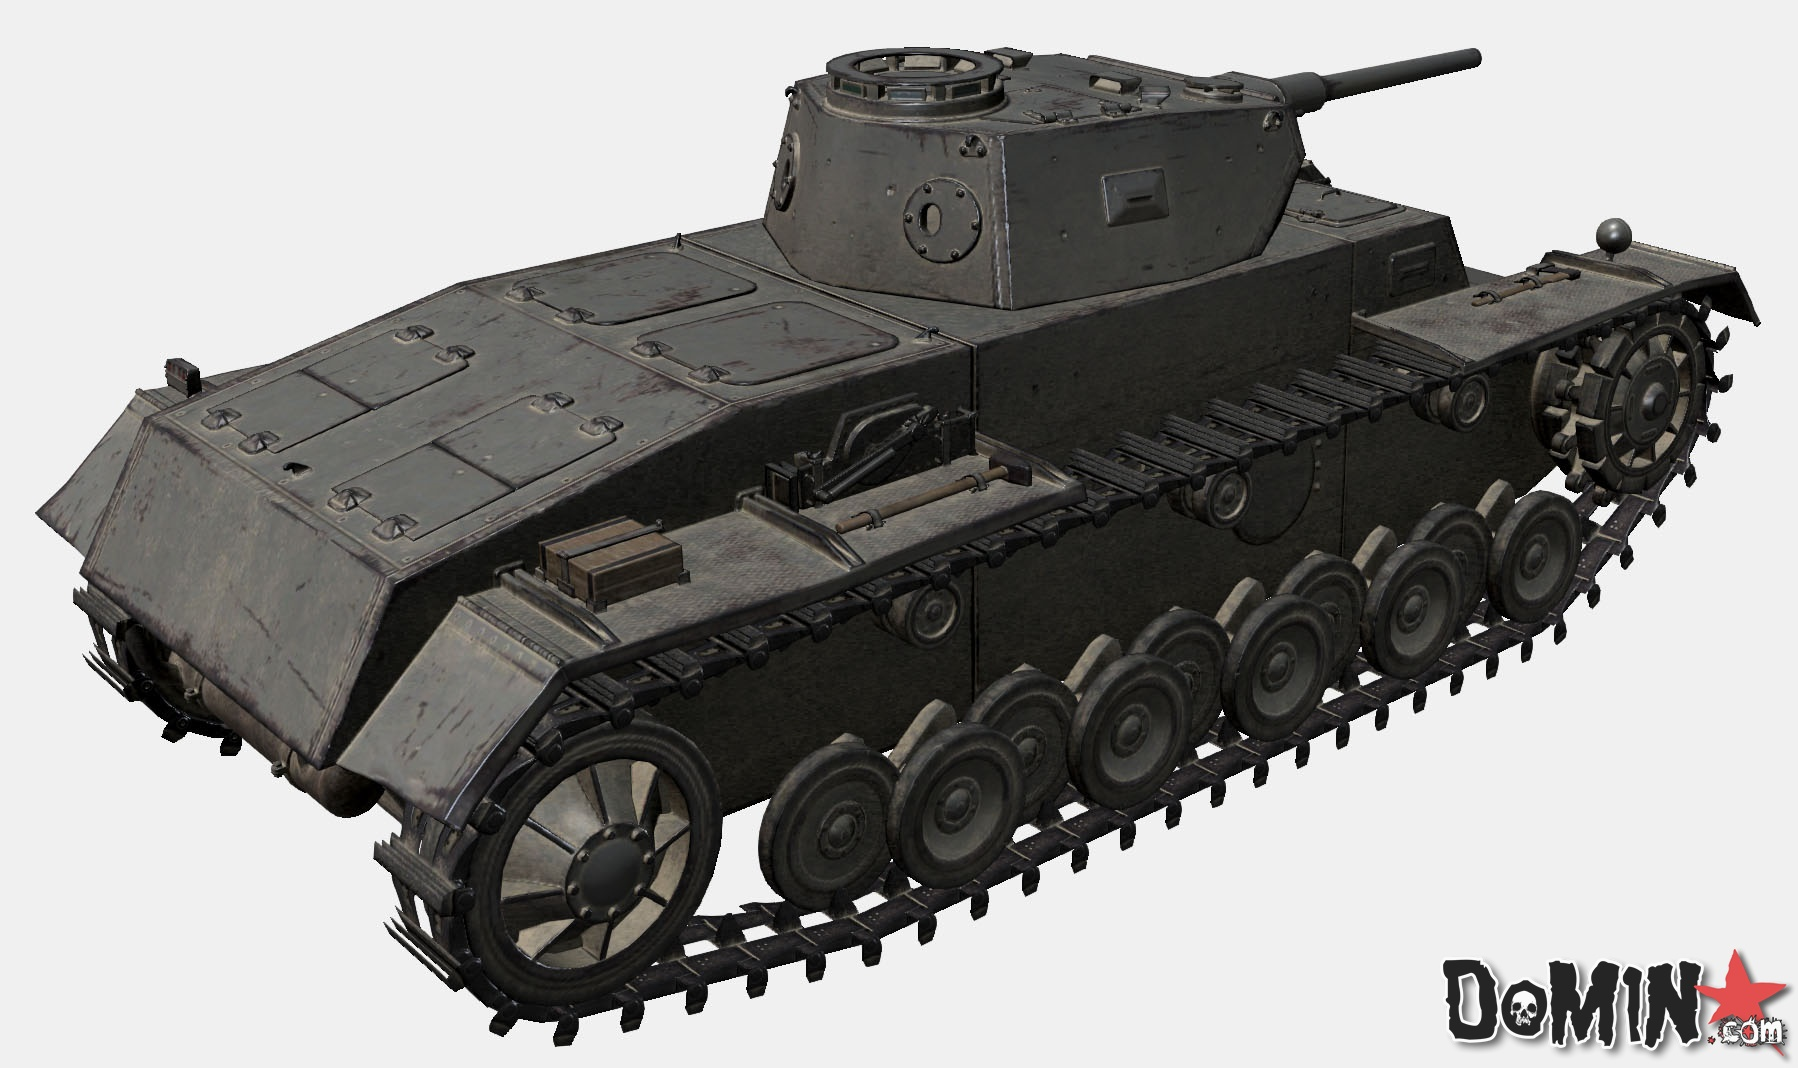 Vk654